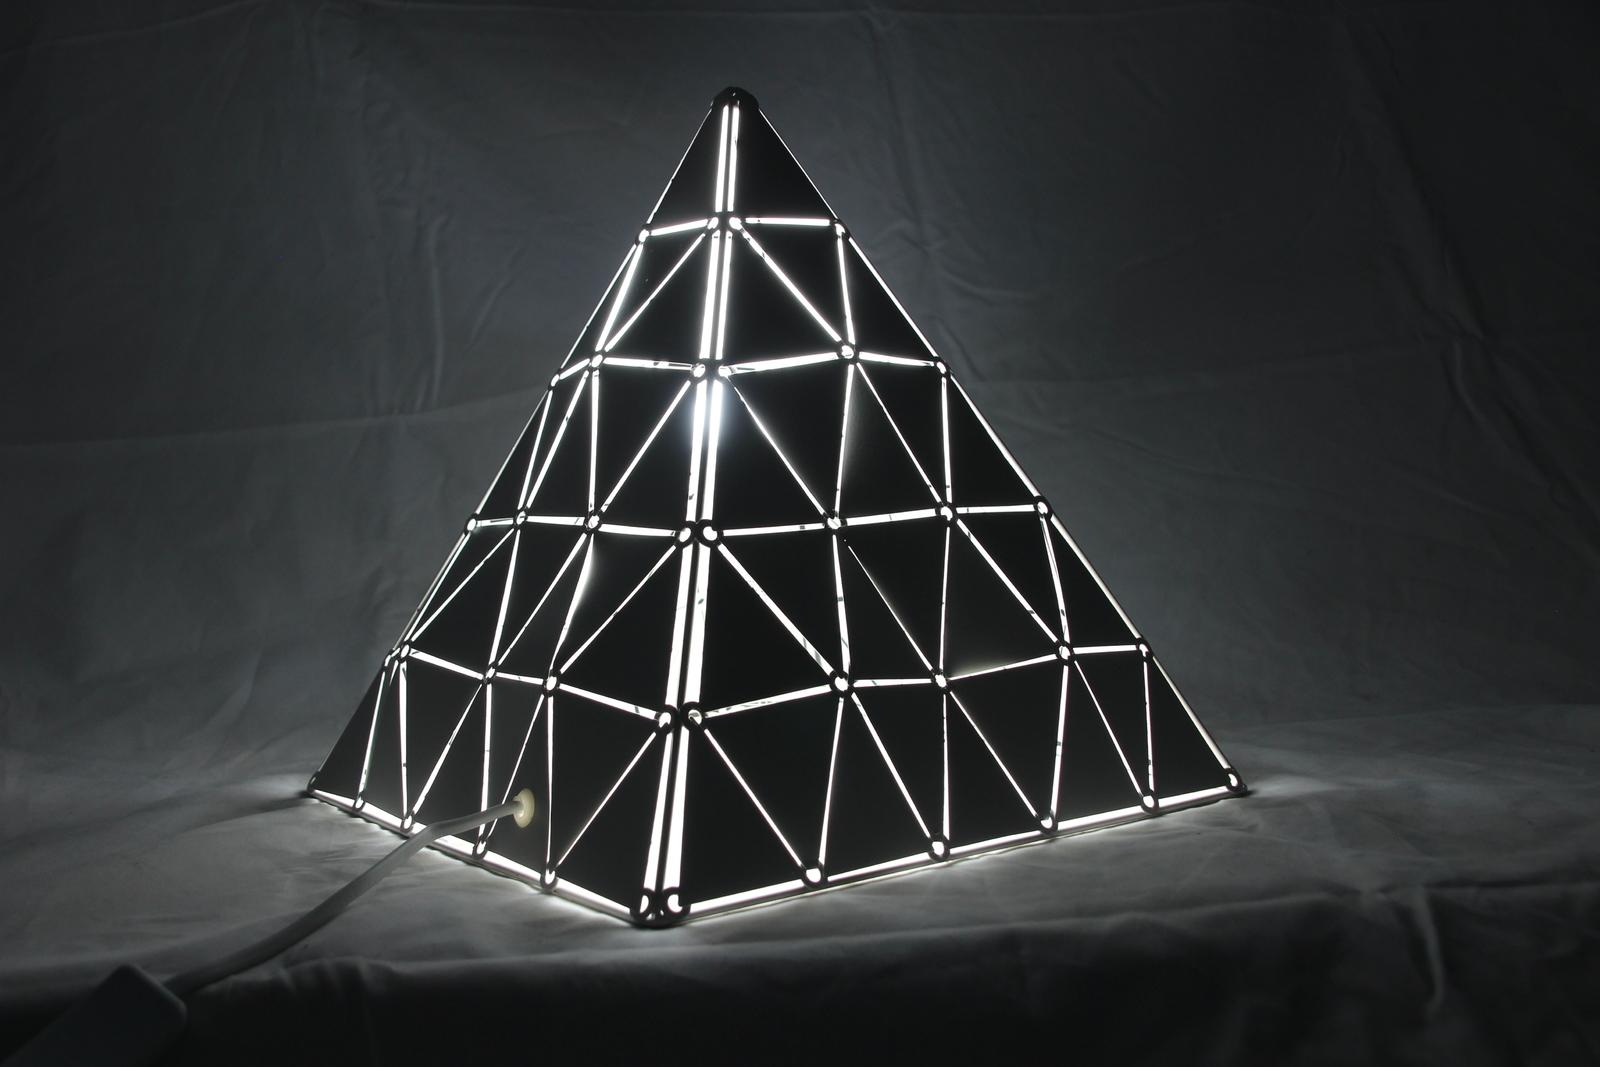 Robotime: White Triangle Light image